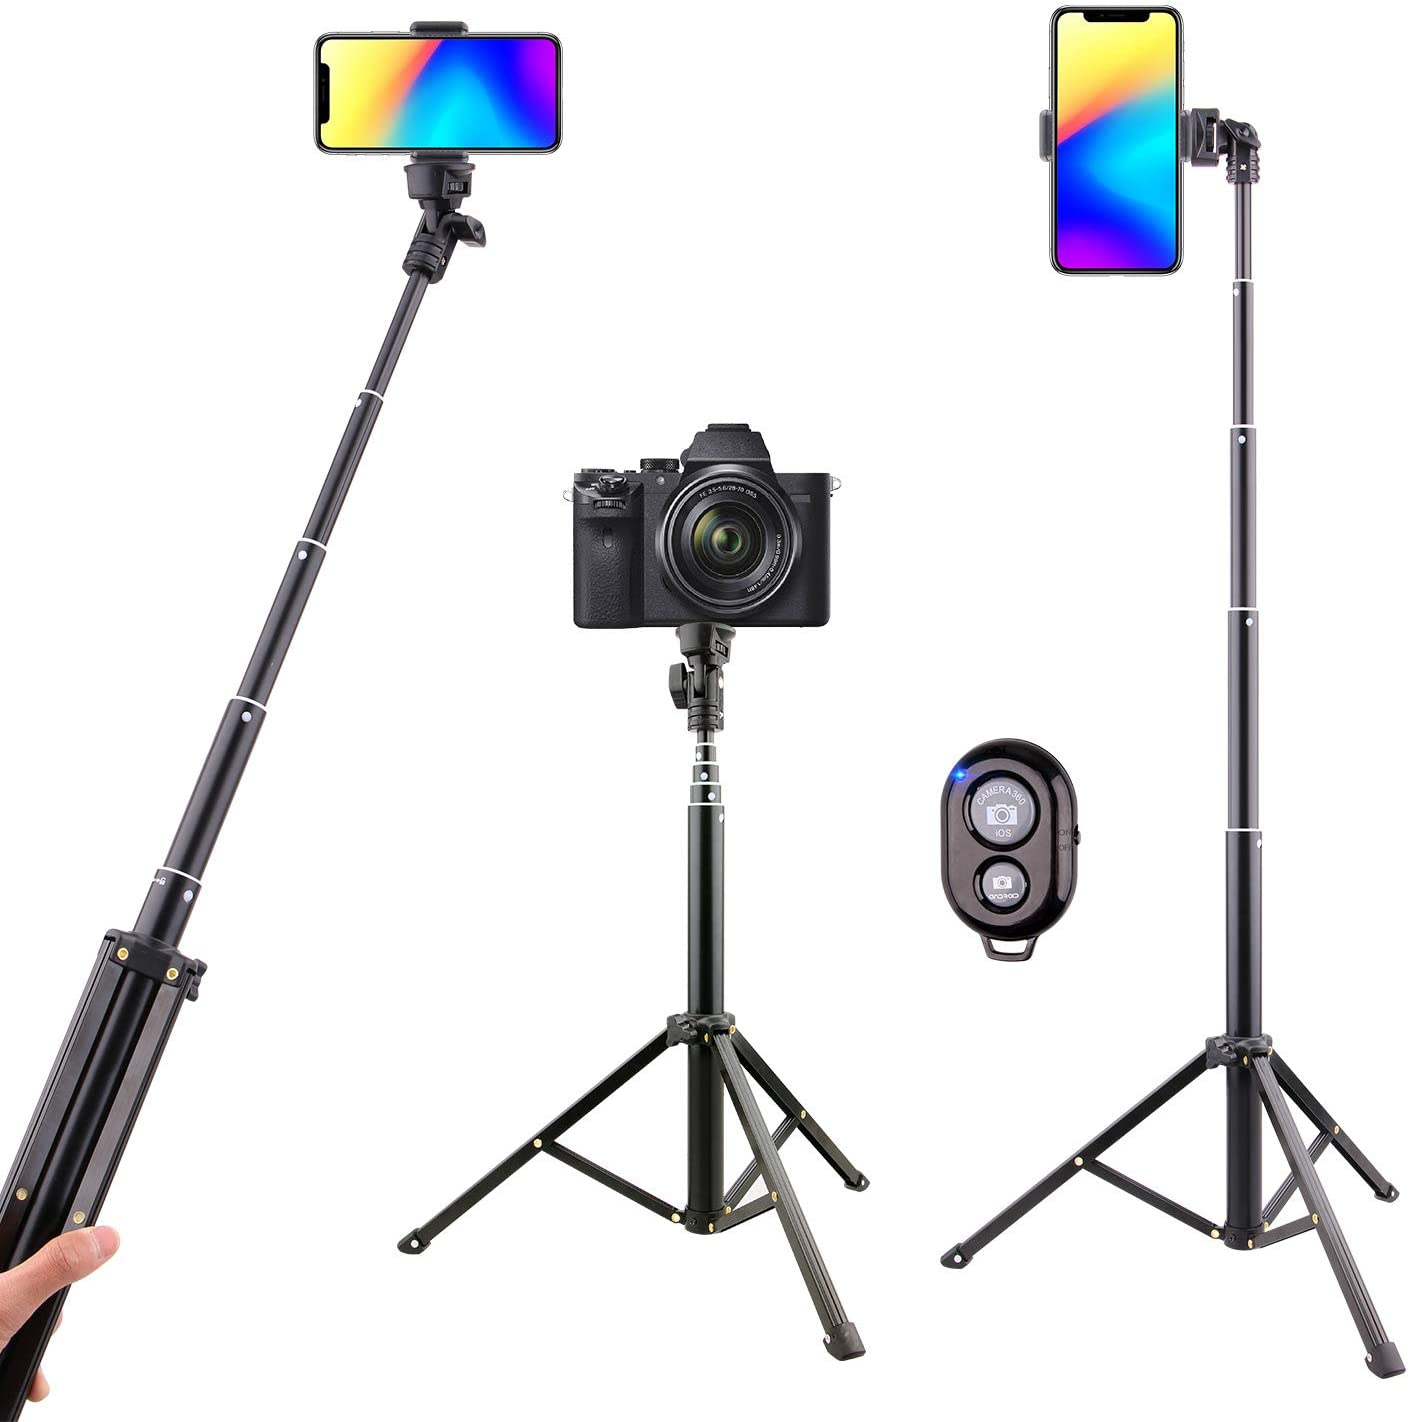 Selfie Stick Tripod Bluetooth, LATZZ 54 Inch Phone Tripod Selfie, Extendable iPhone Stand Tripod with Wireless Remote Shutter Compatible iPhone 11 Pro/Xs MAX/XR/X/8/8P/7/Galaxy Note 8/S10/S9+/S9, More